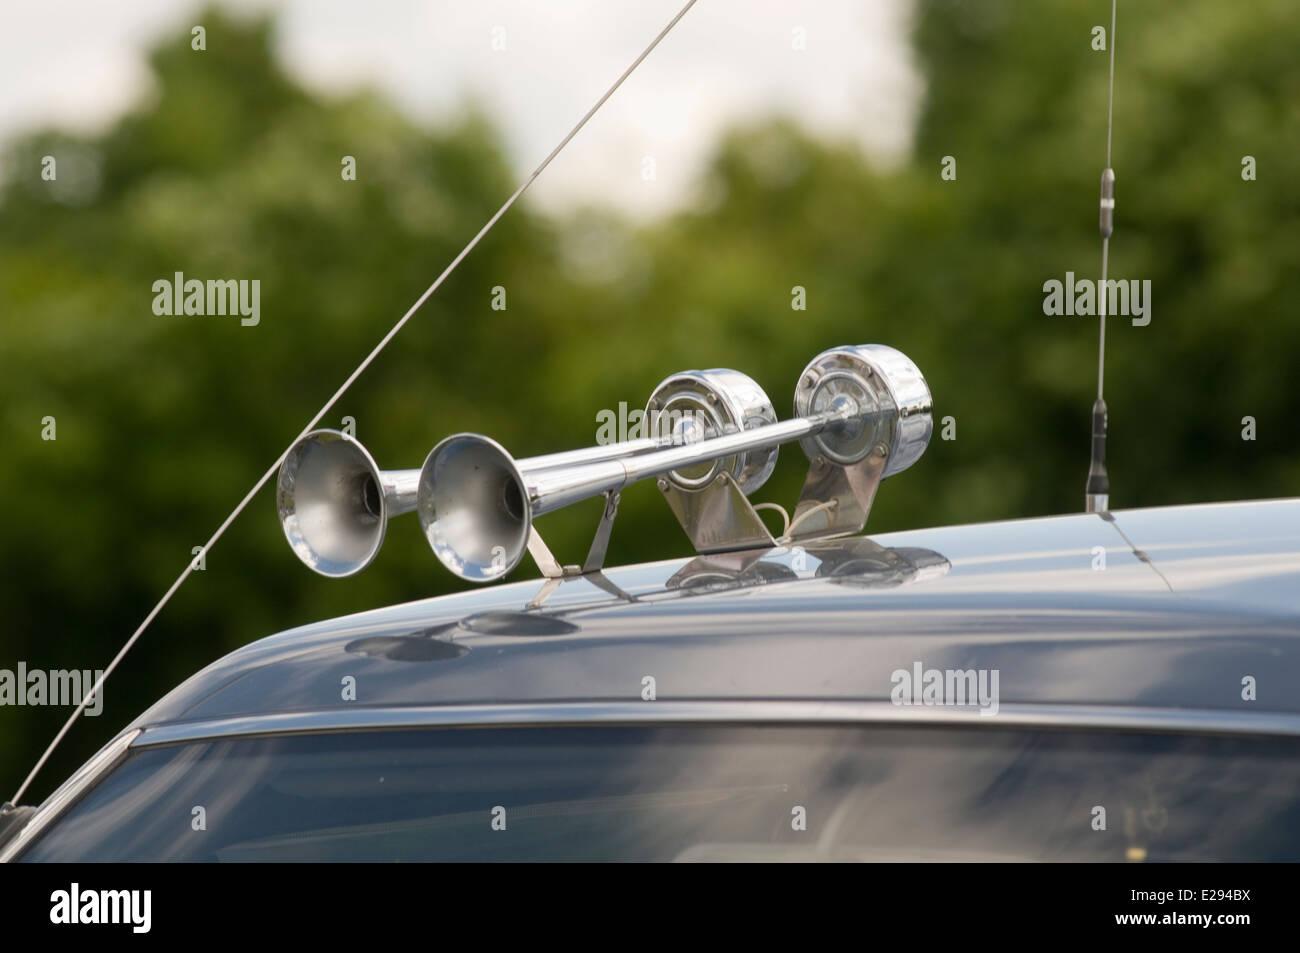 car horn air airhorn airhorns horns beep blow blowing cars - Stock Image